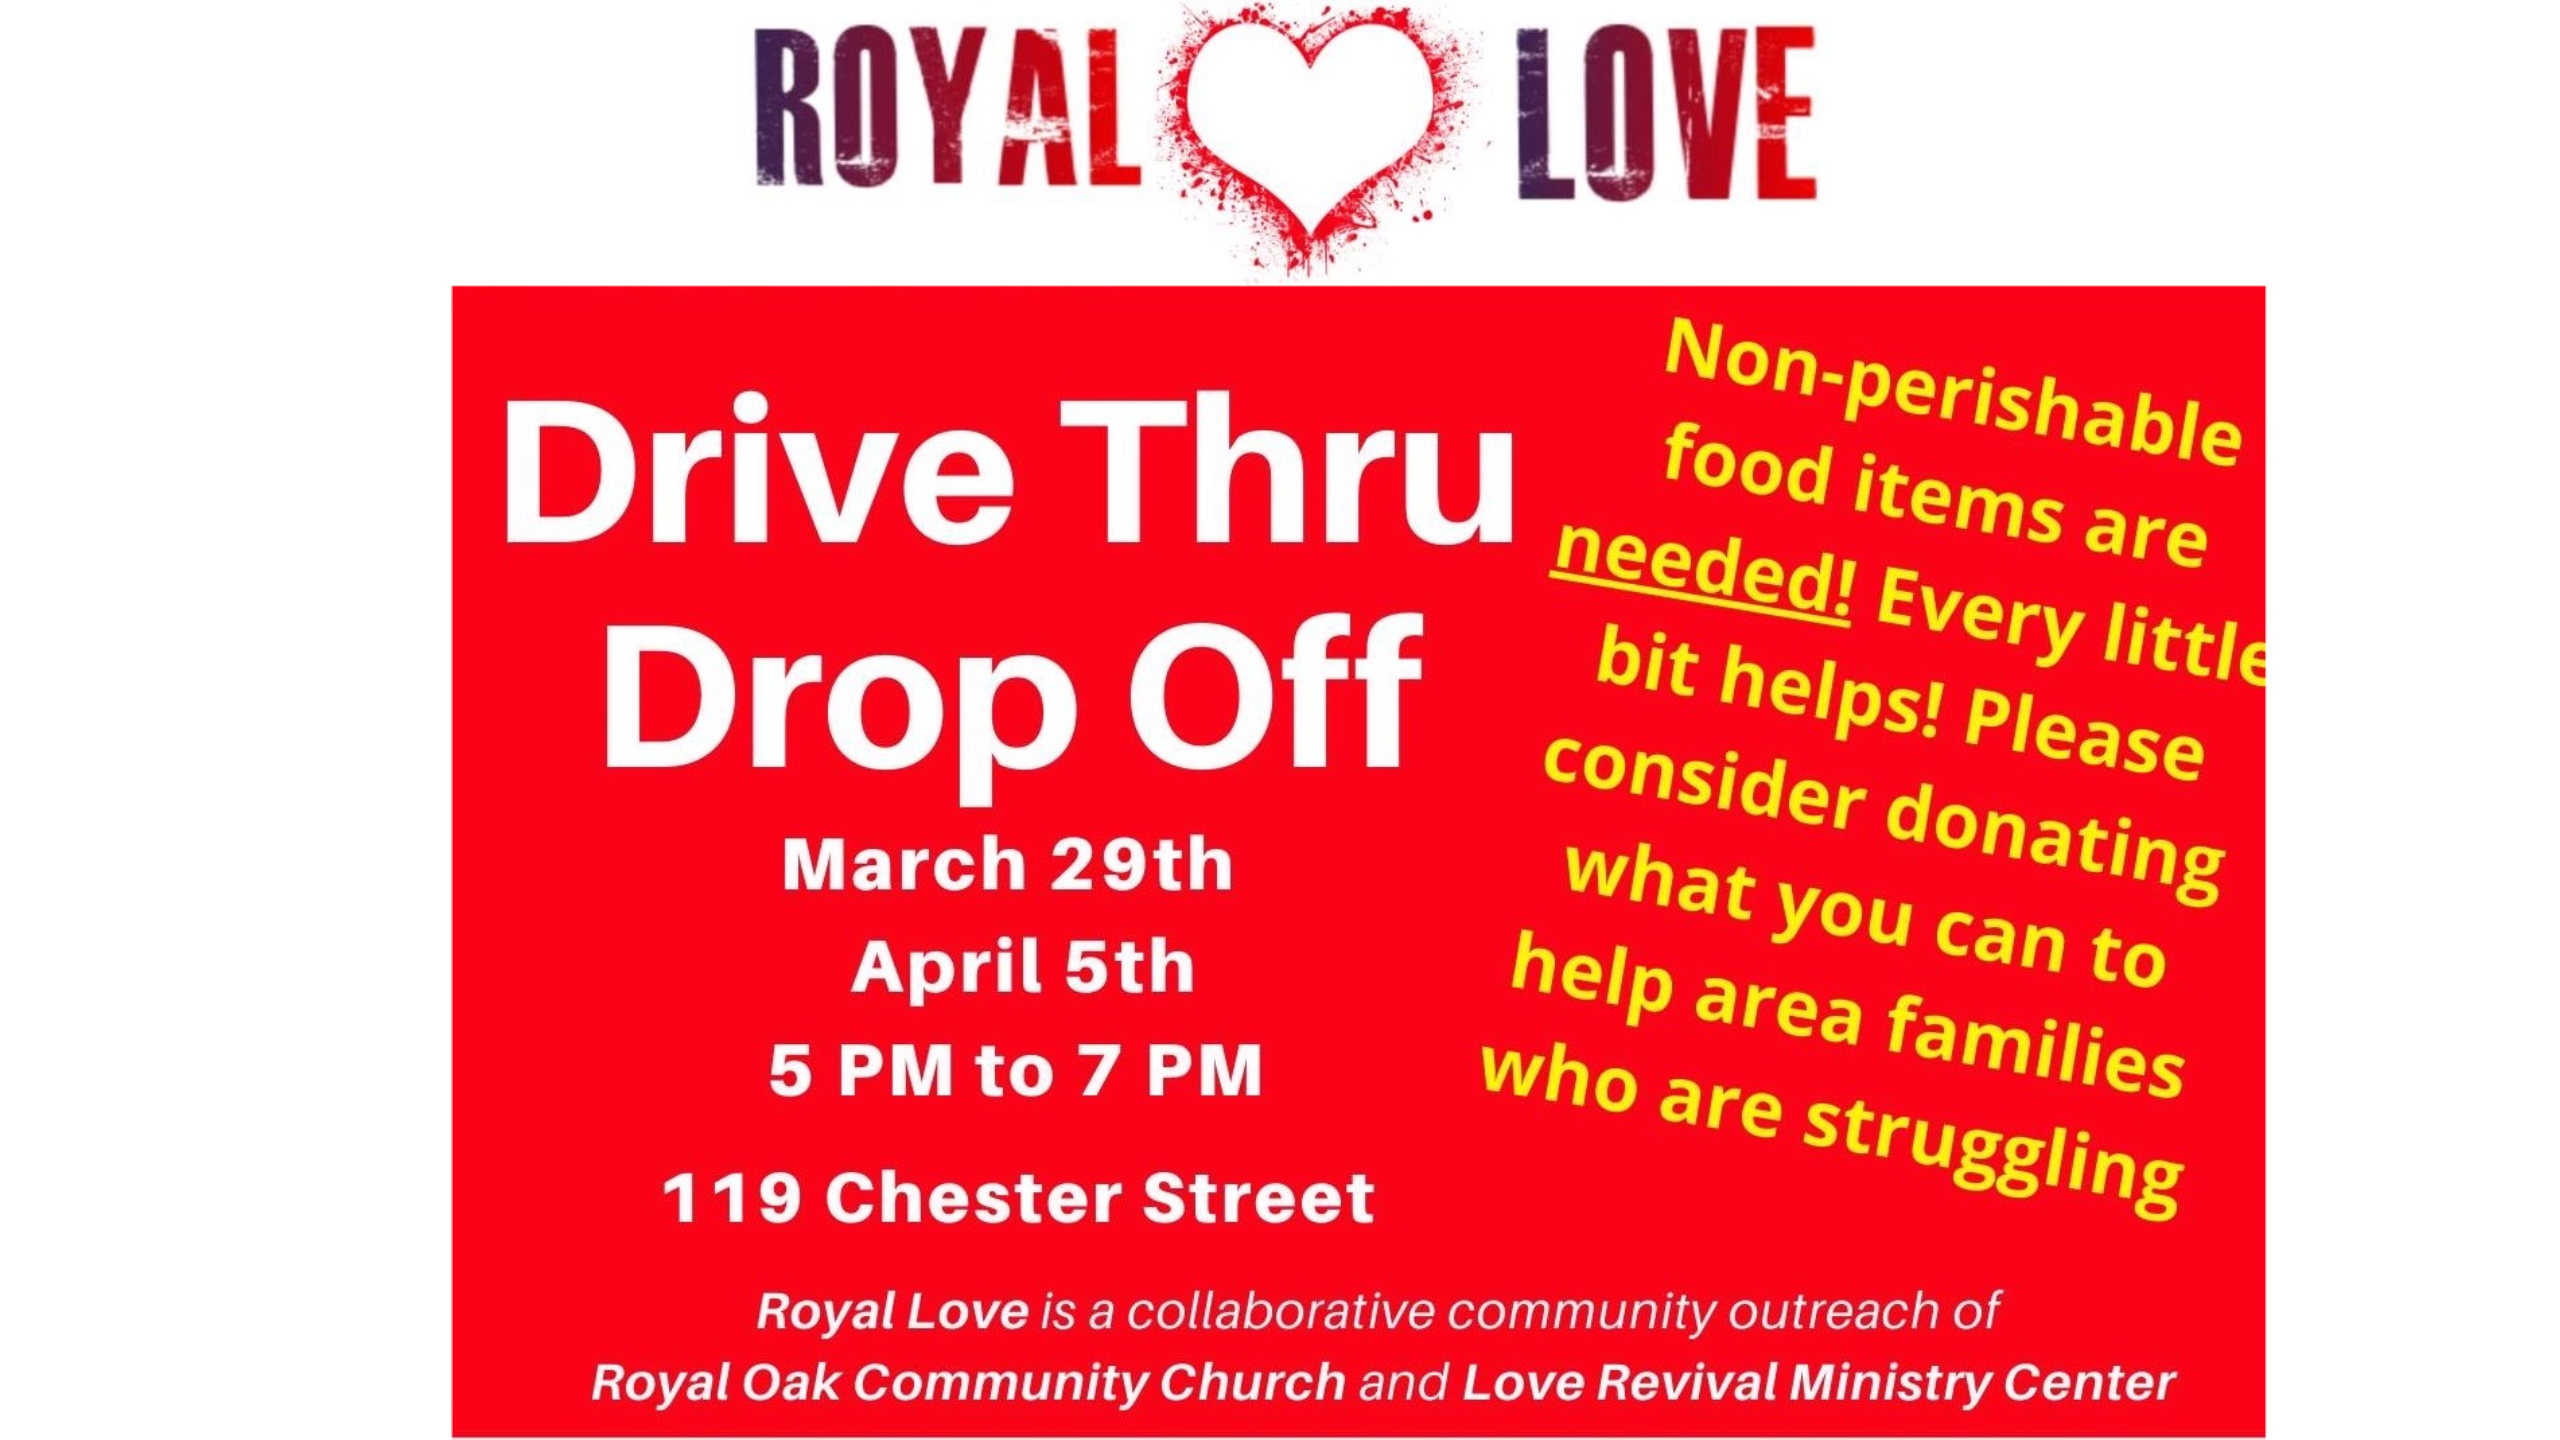 RoyalLove_DropOff